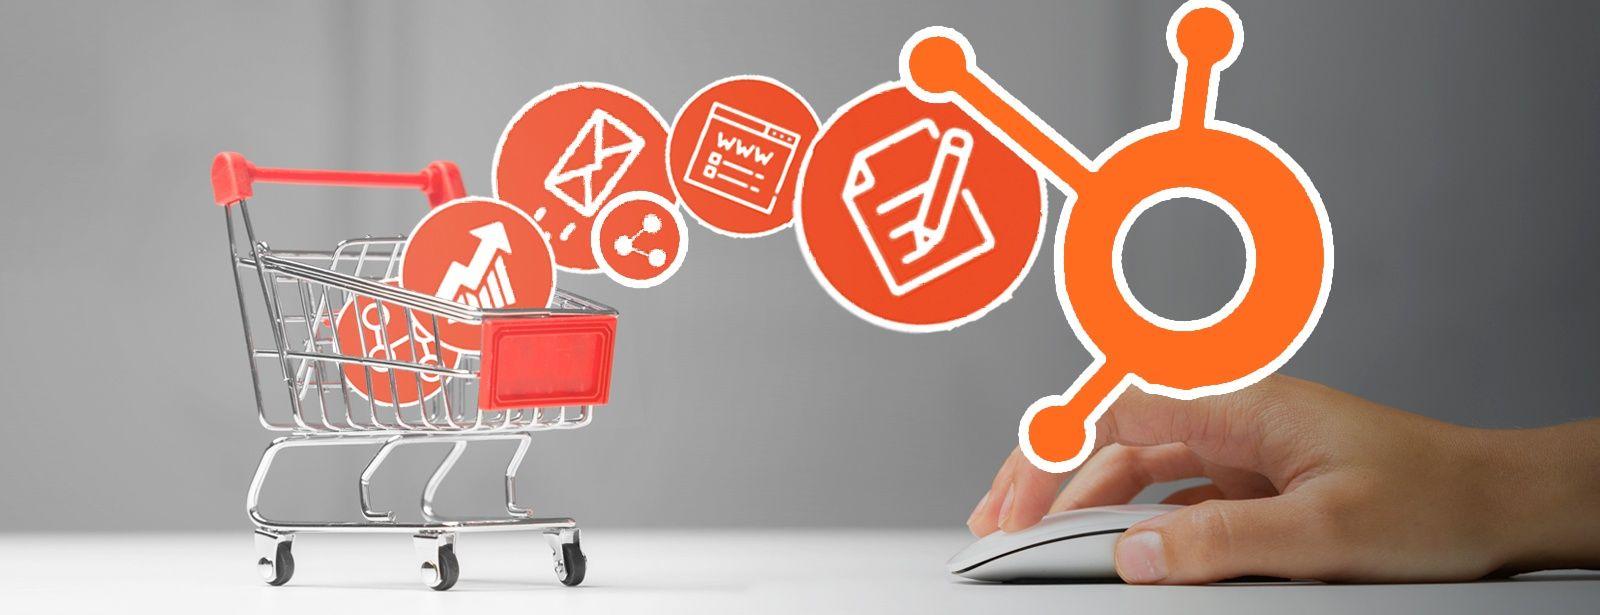 201801-ManoByte-Why-Buy-HubSpot-Through-an-Inbound-Marketing-Agency.jpg